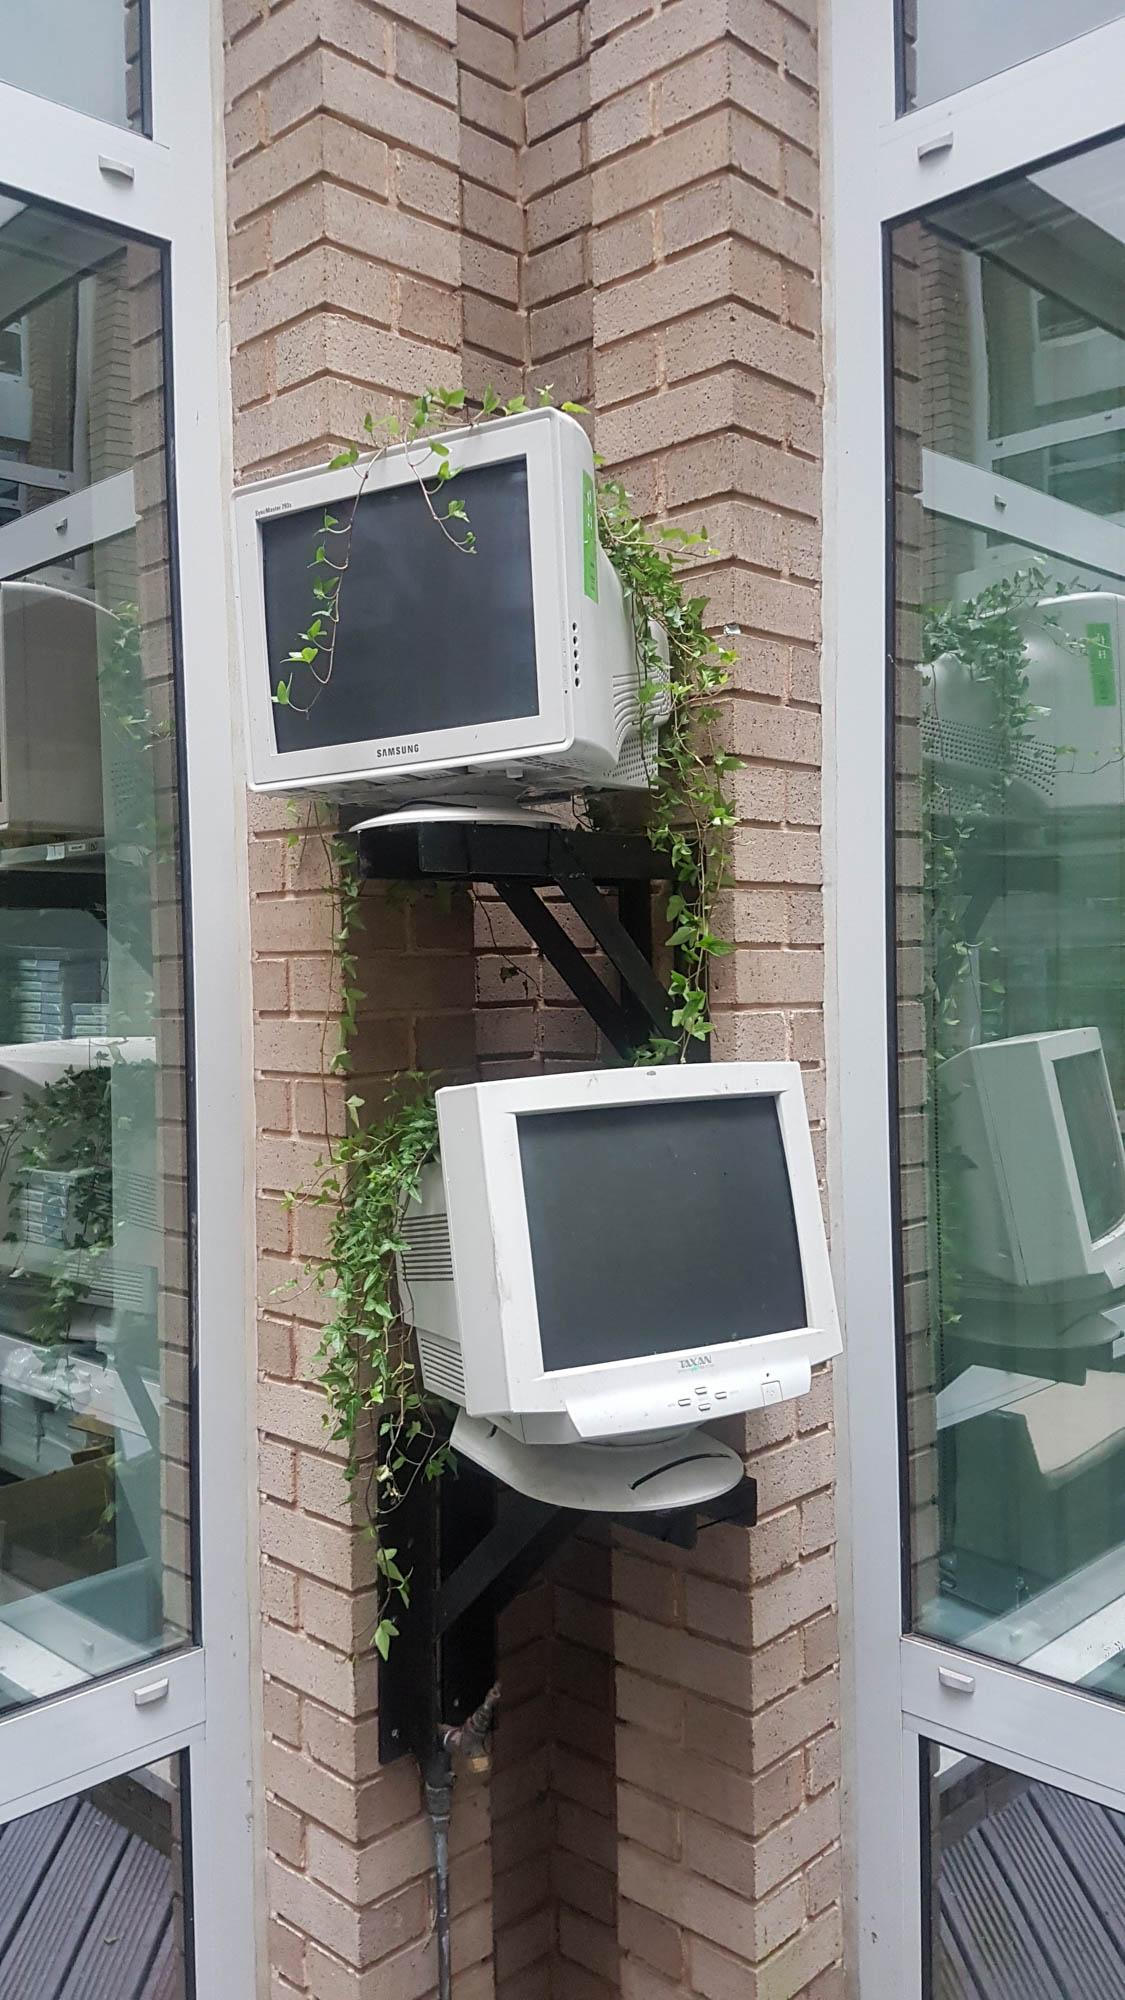 20170711_150321.jpbristol-computer-society-exterior-plant-displays-plantcare-image-3